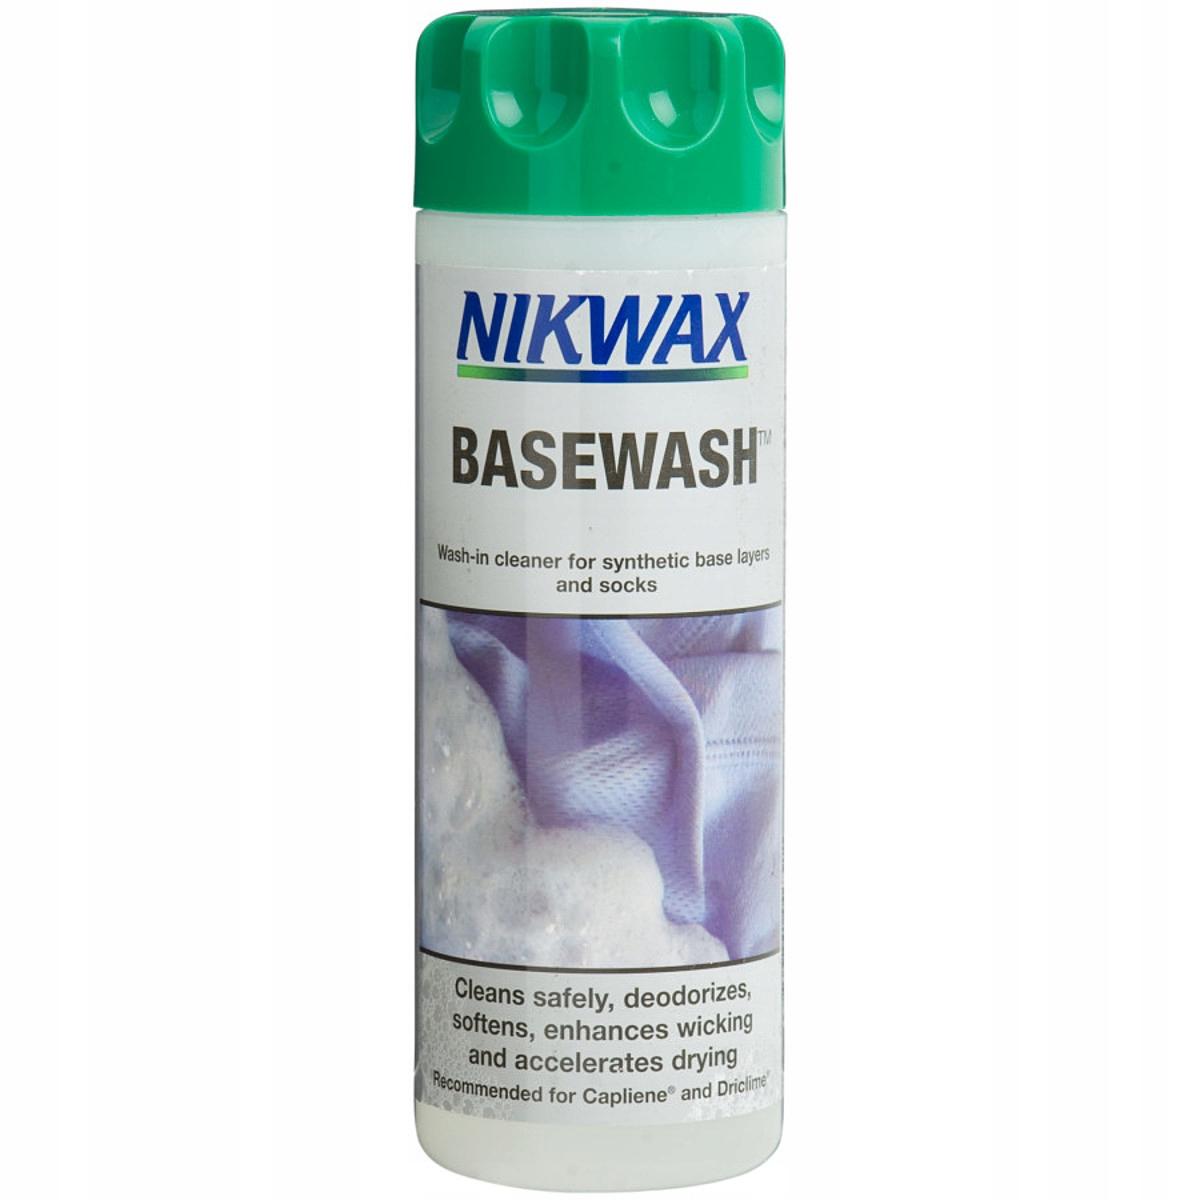 Nikwax Base Wash 300 мл для одежды termoaktywnej